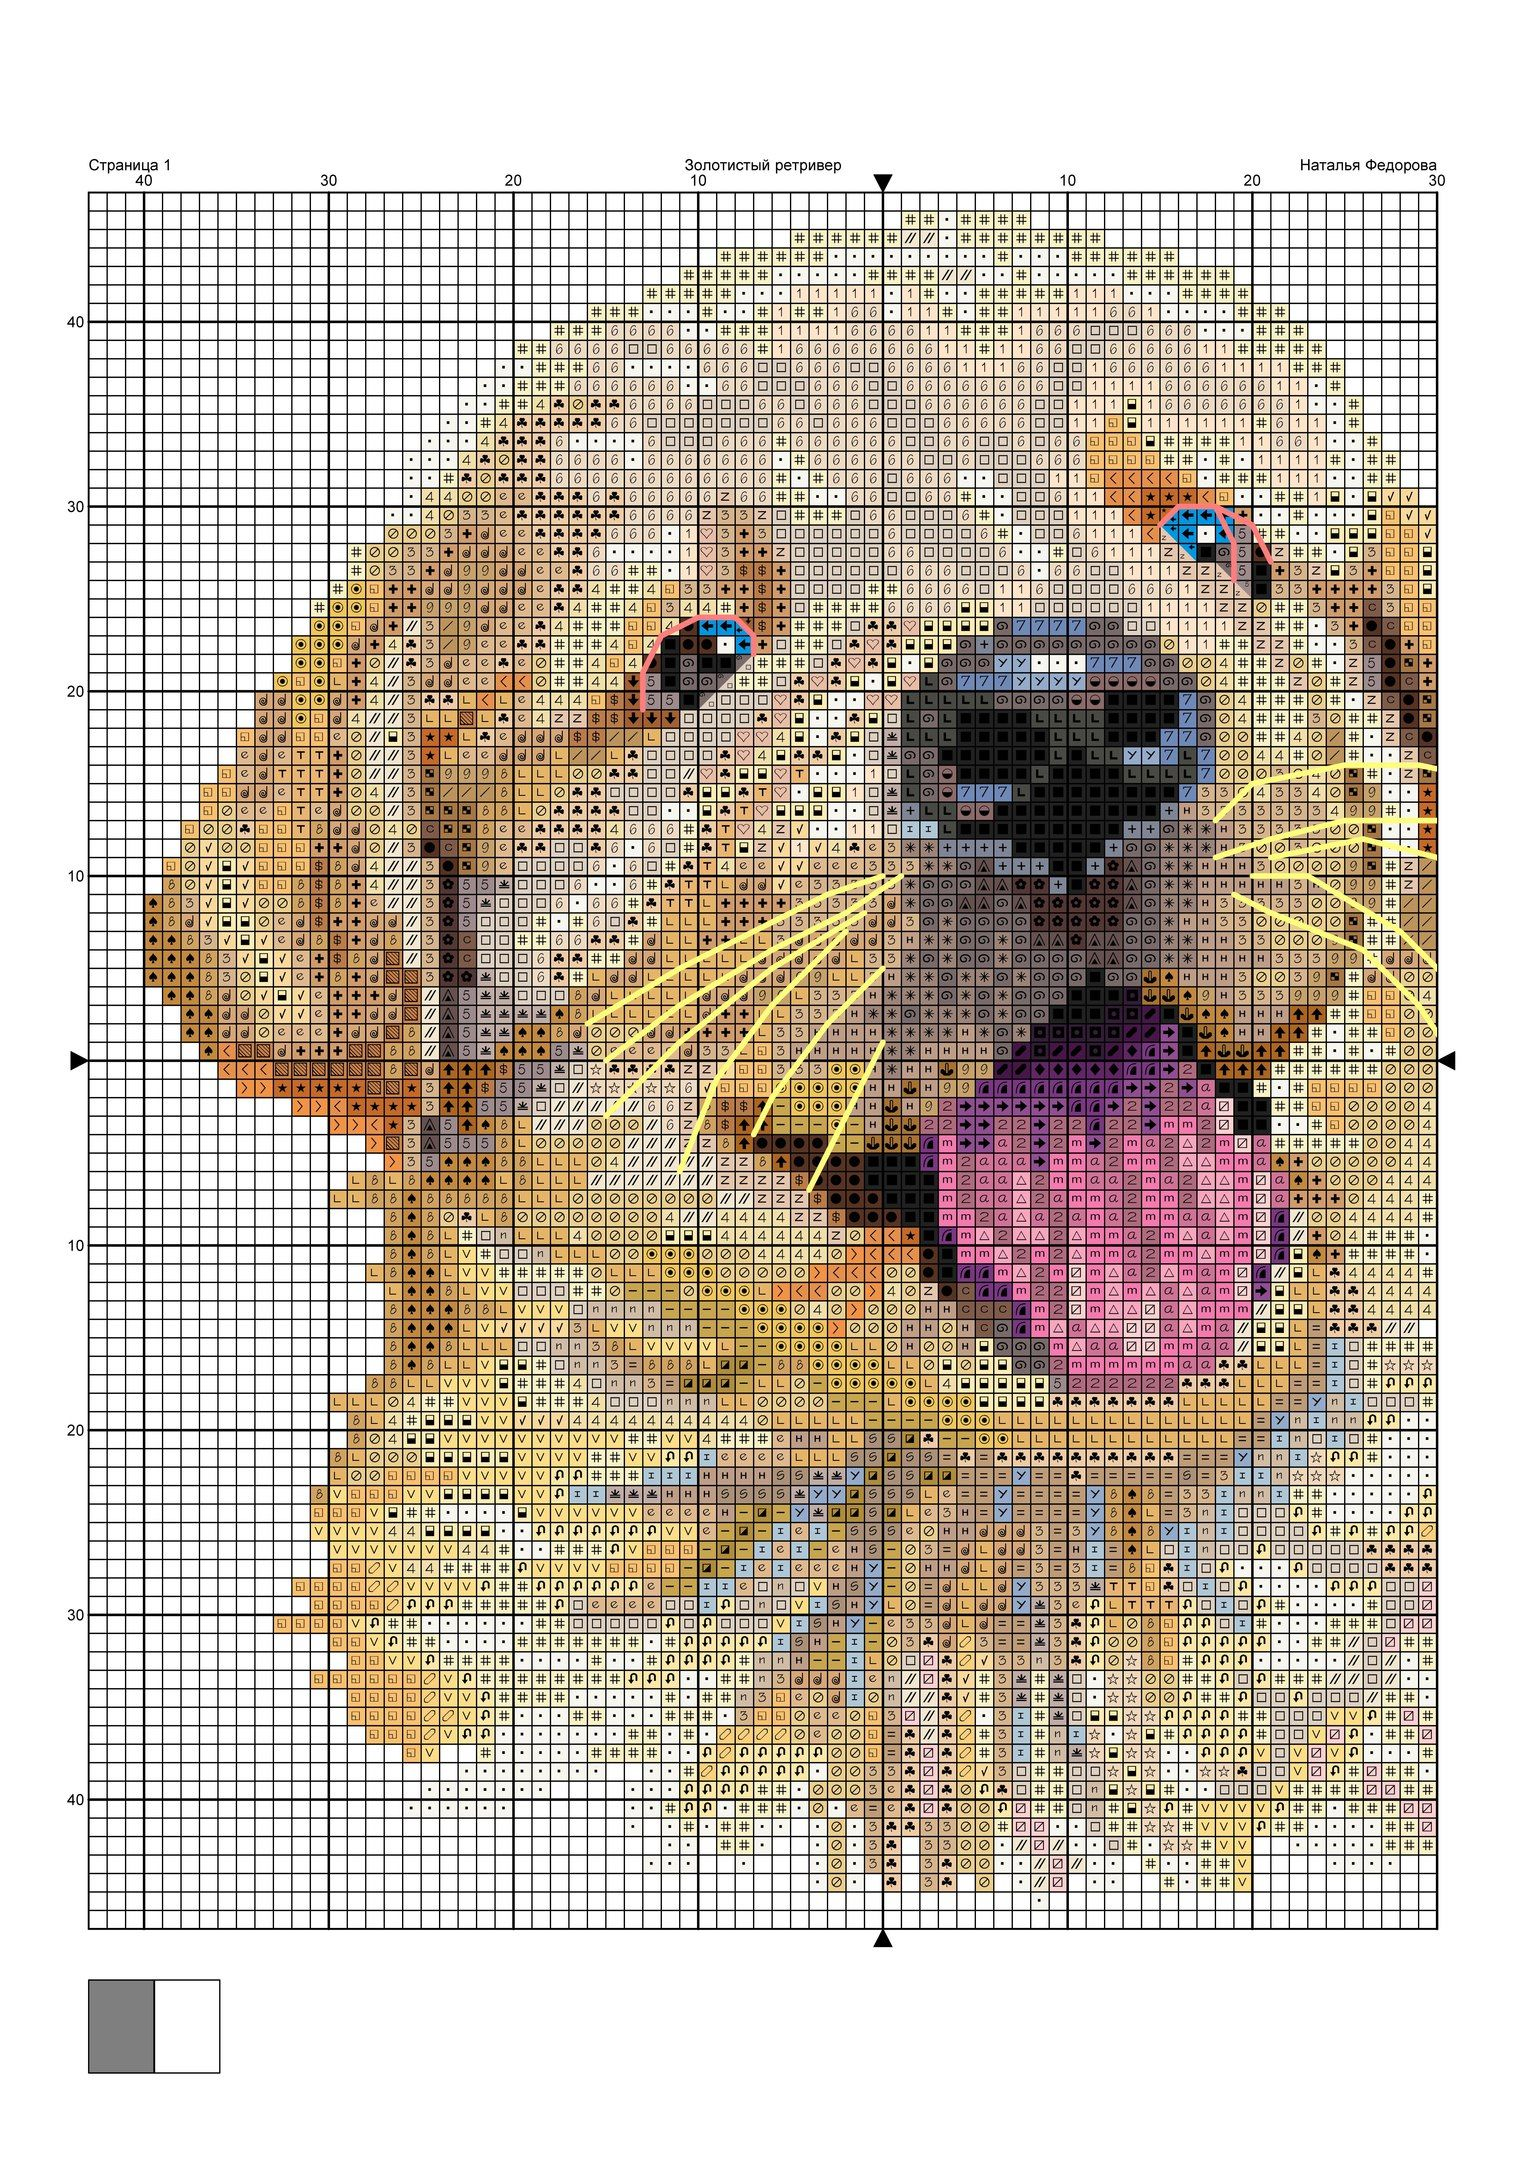 8C73hNGX7Us.jpg 1,527×2,160 pixels